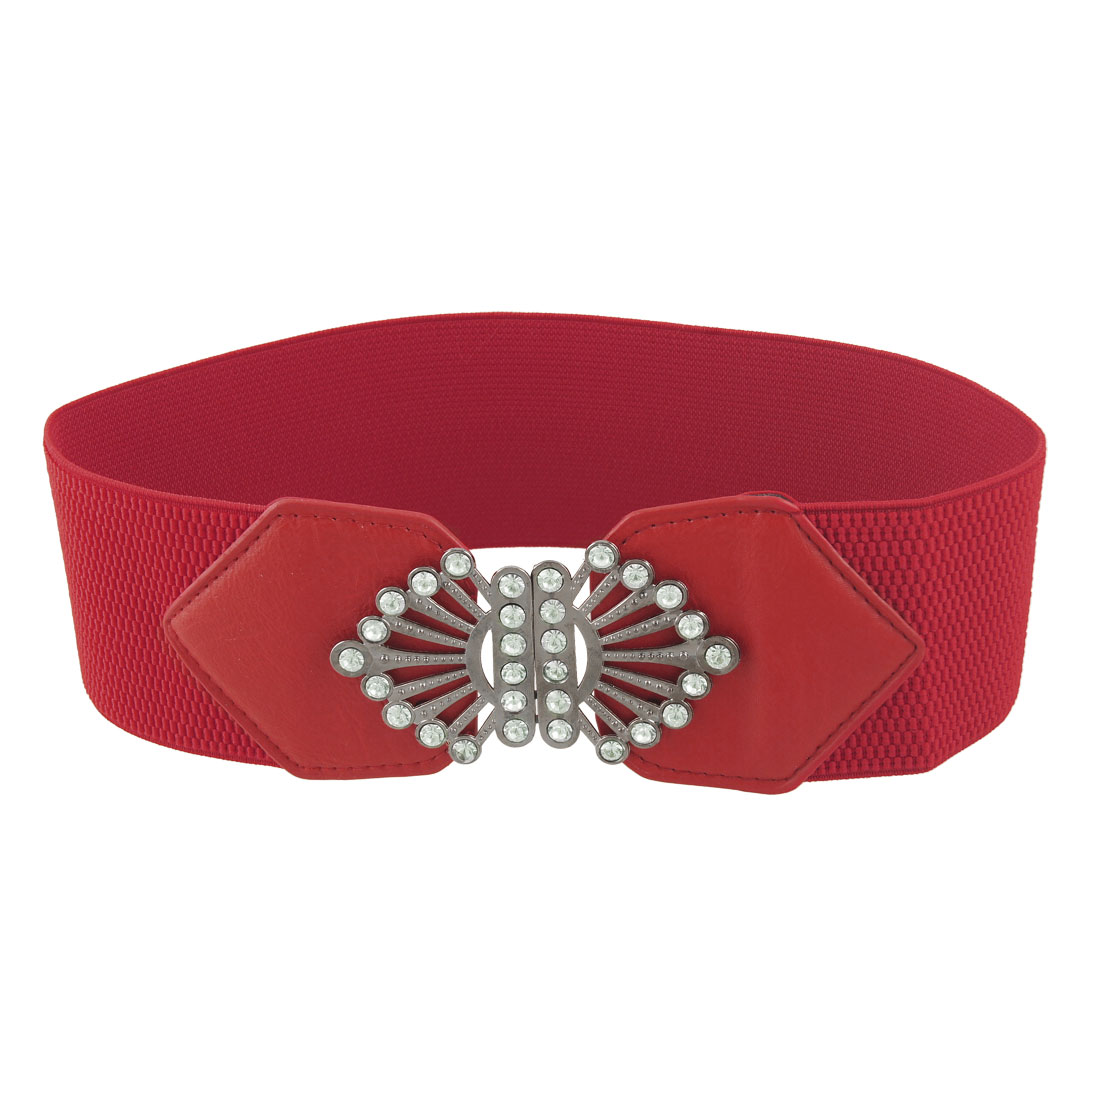 Ladies Rhinestone Inlaid Metal Buckle Stretchy Waist Belt Red